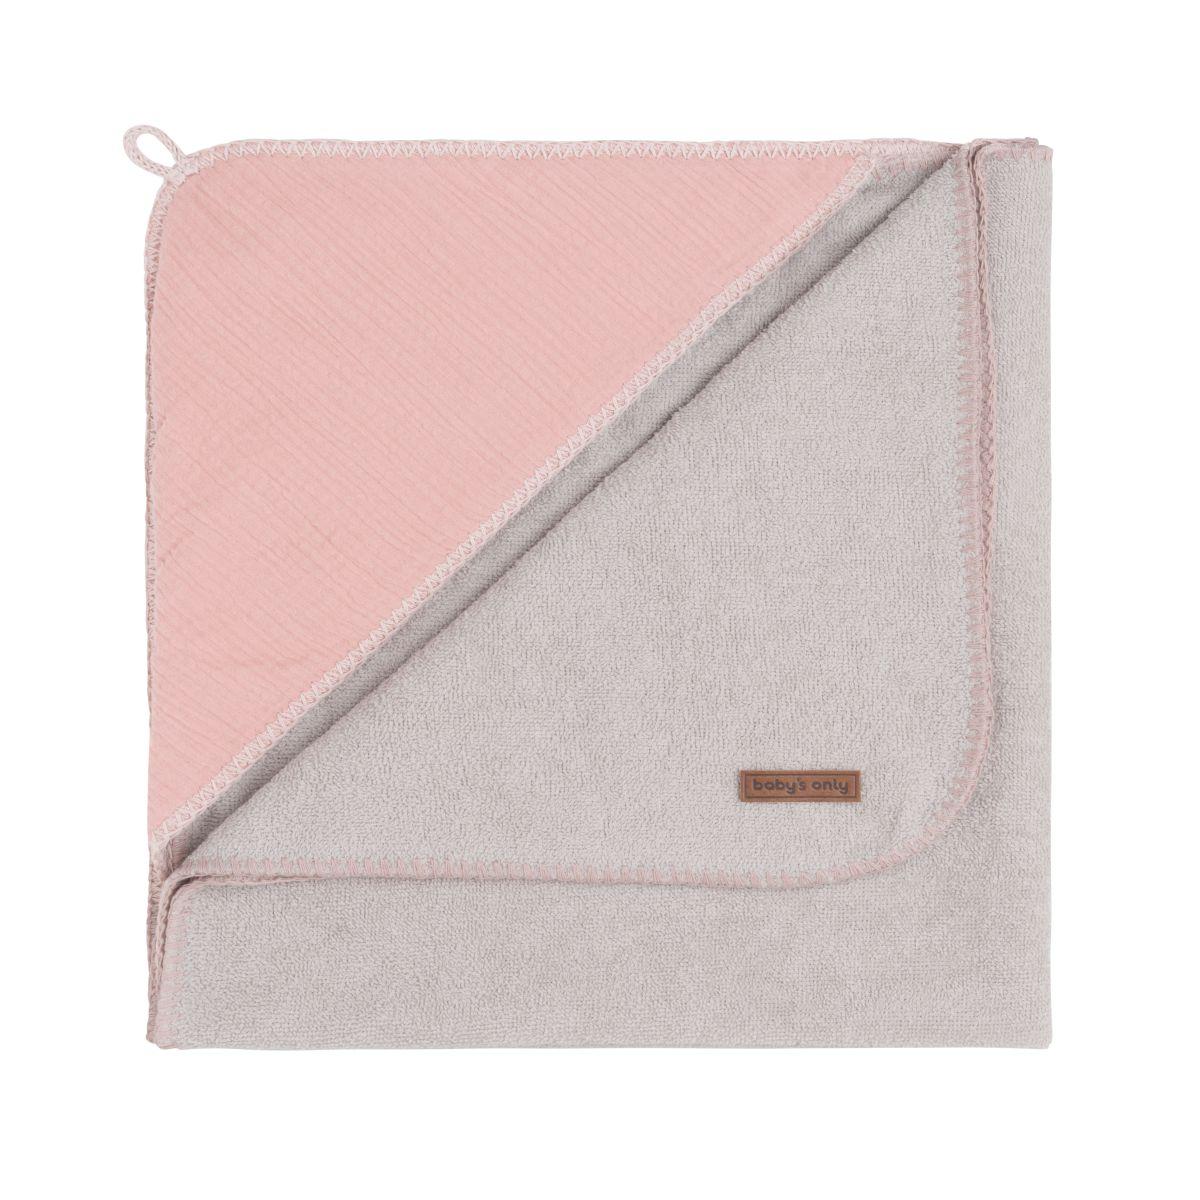 bathcape breeze old pink 75x85